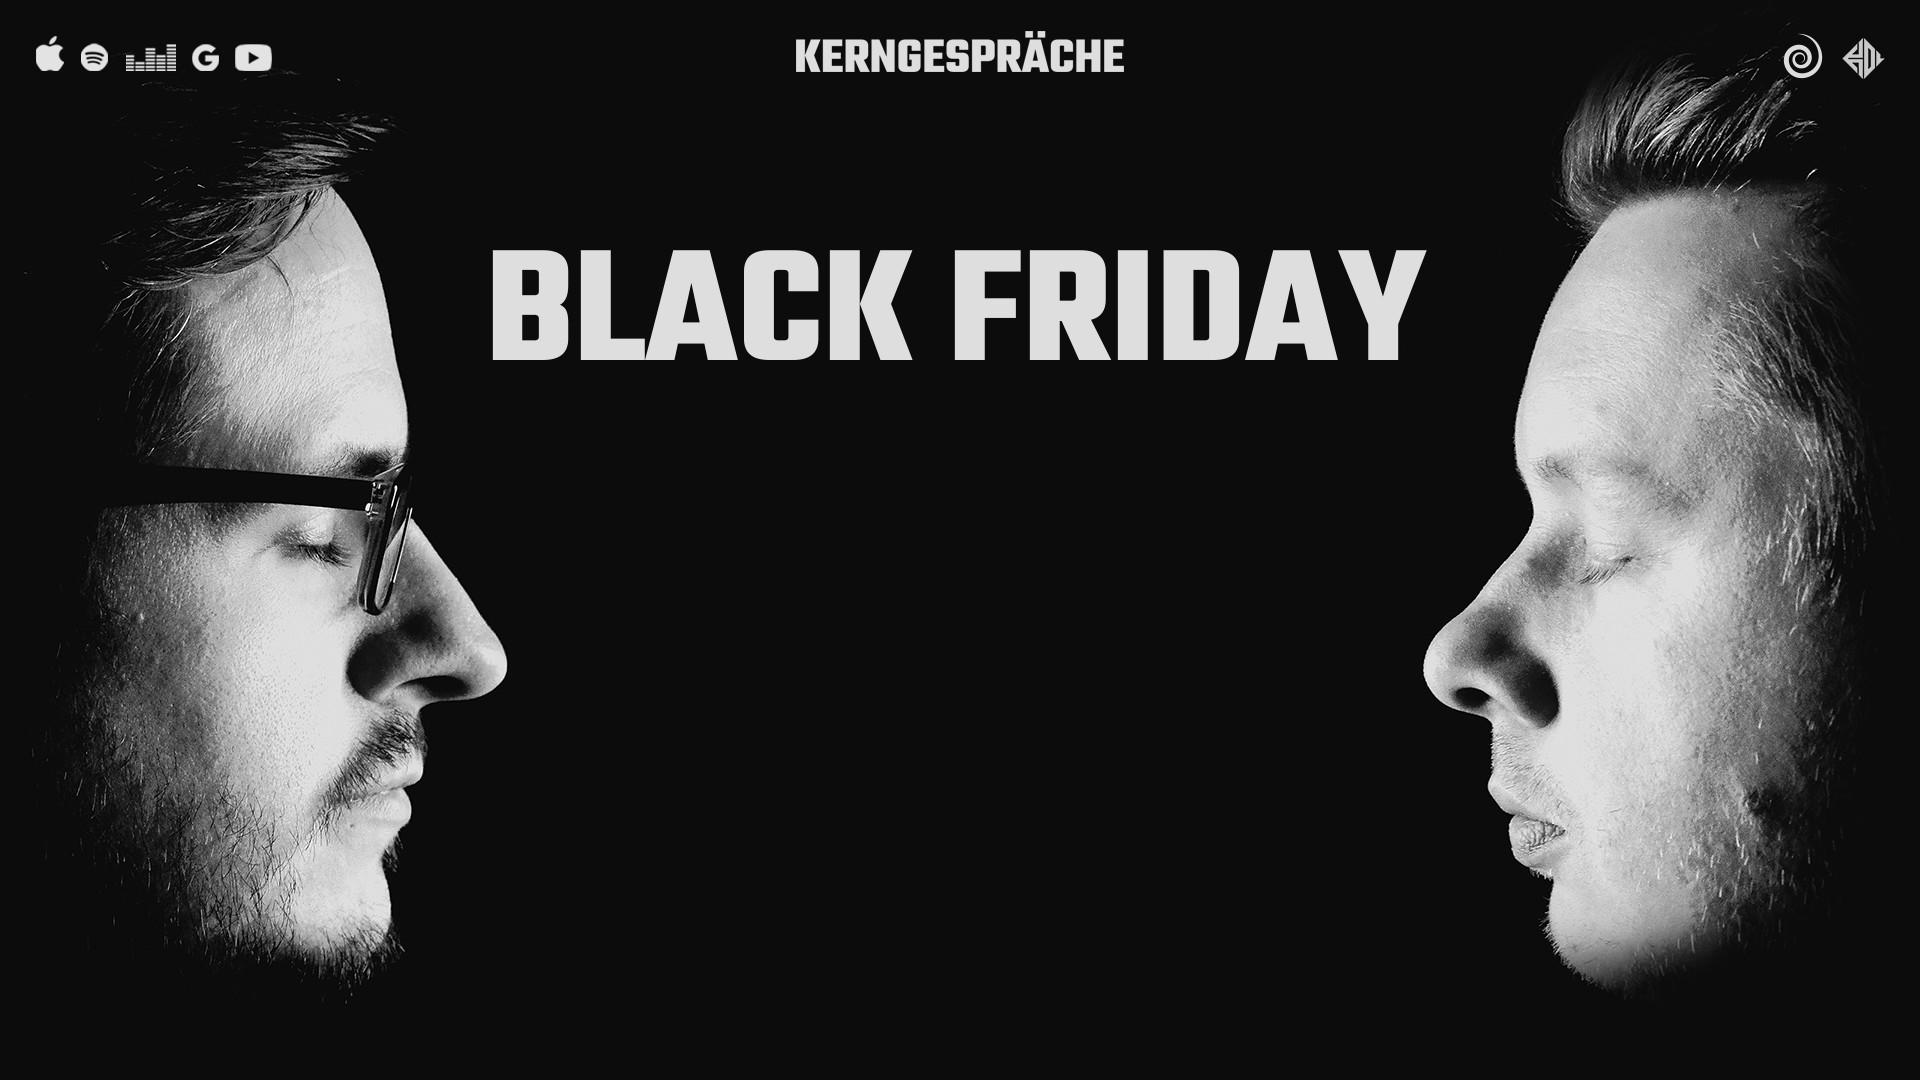 Black Friday: Hat da wer Rabatt gesagt?